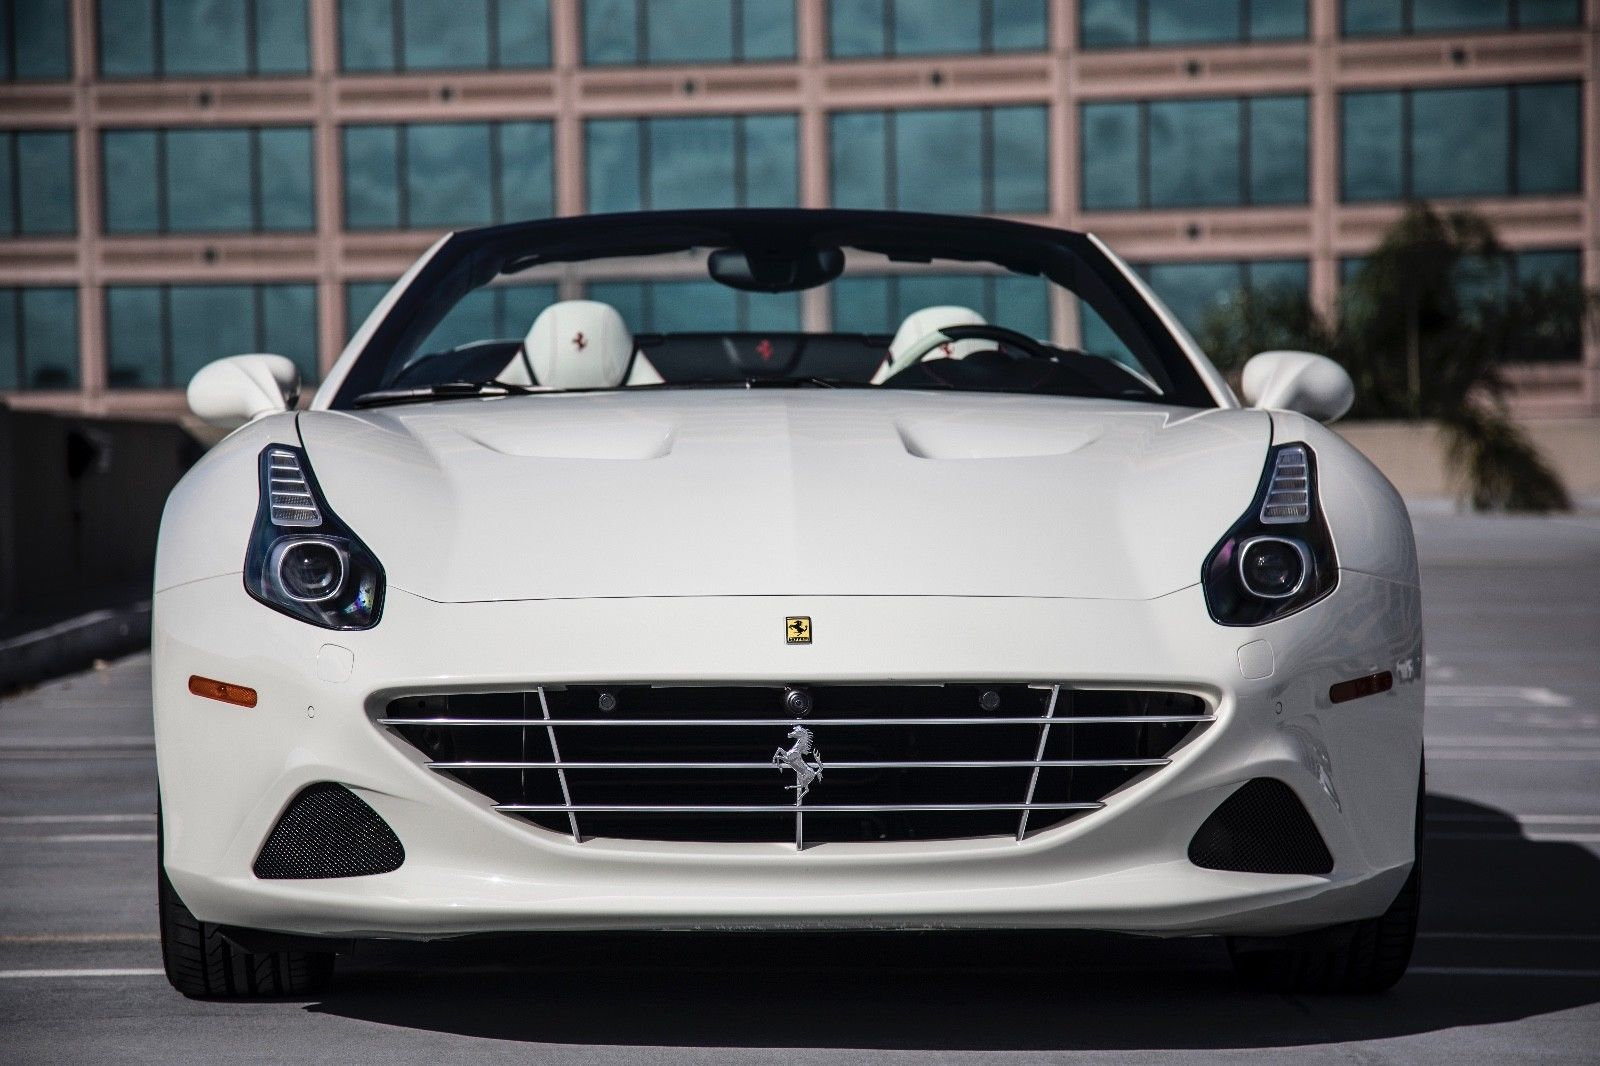 Amazing 2015 Ferrari California T 2015 Ferrari California T White Special Order White Interior 2018 2019